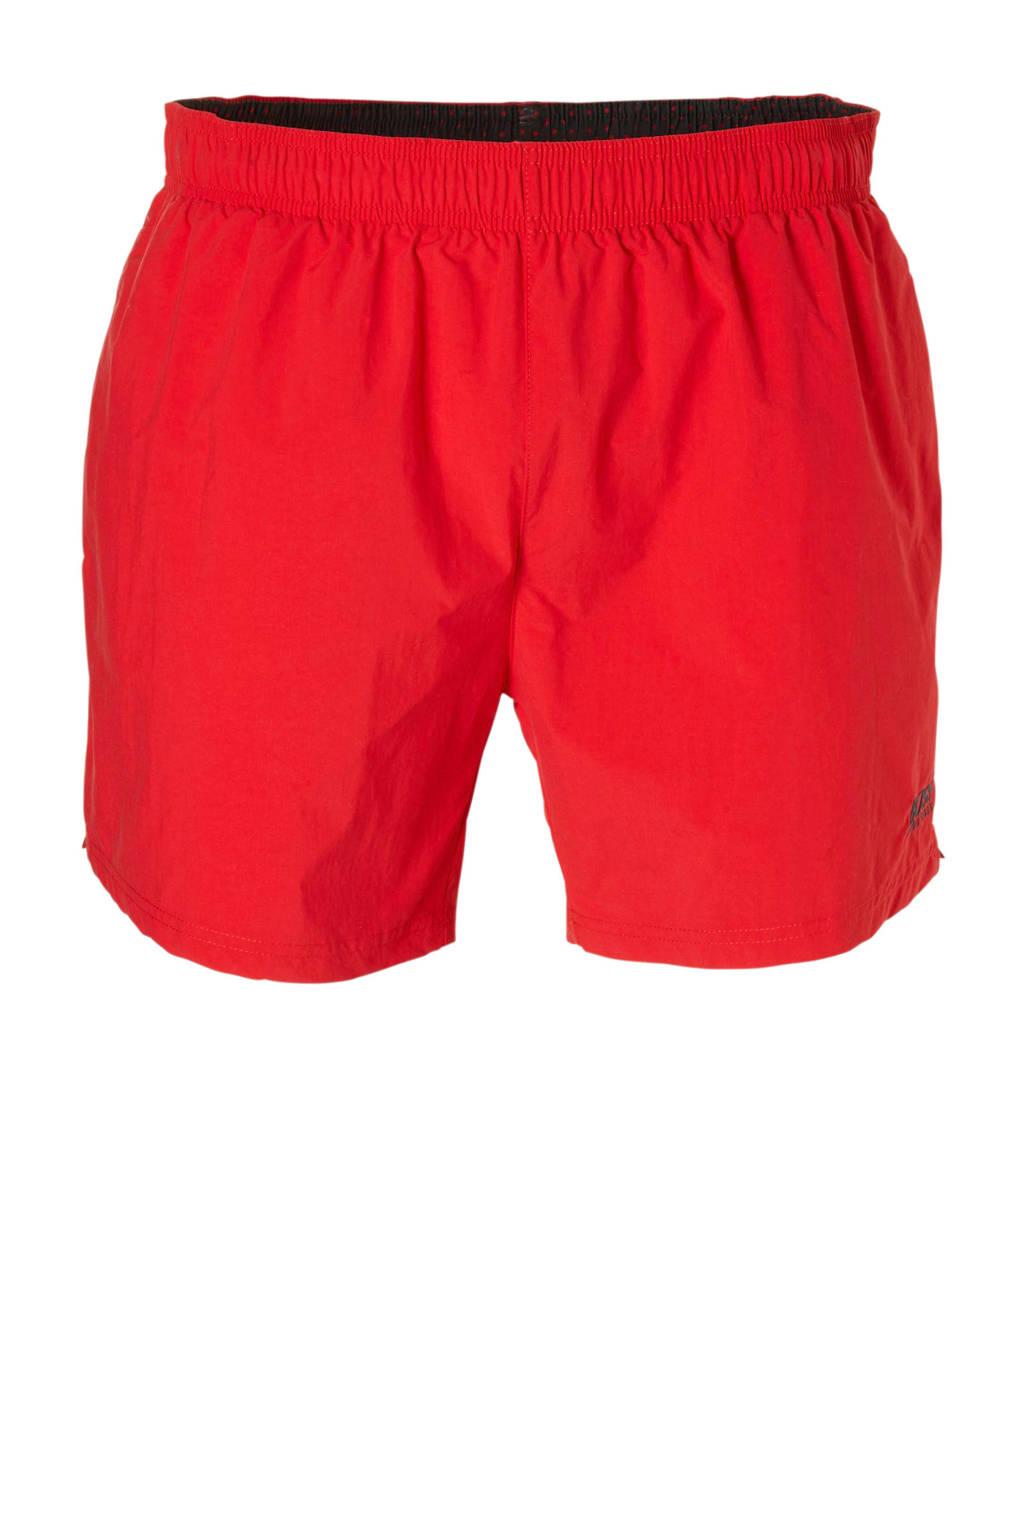 BOSS zwemshort met zakken rood, Rood